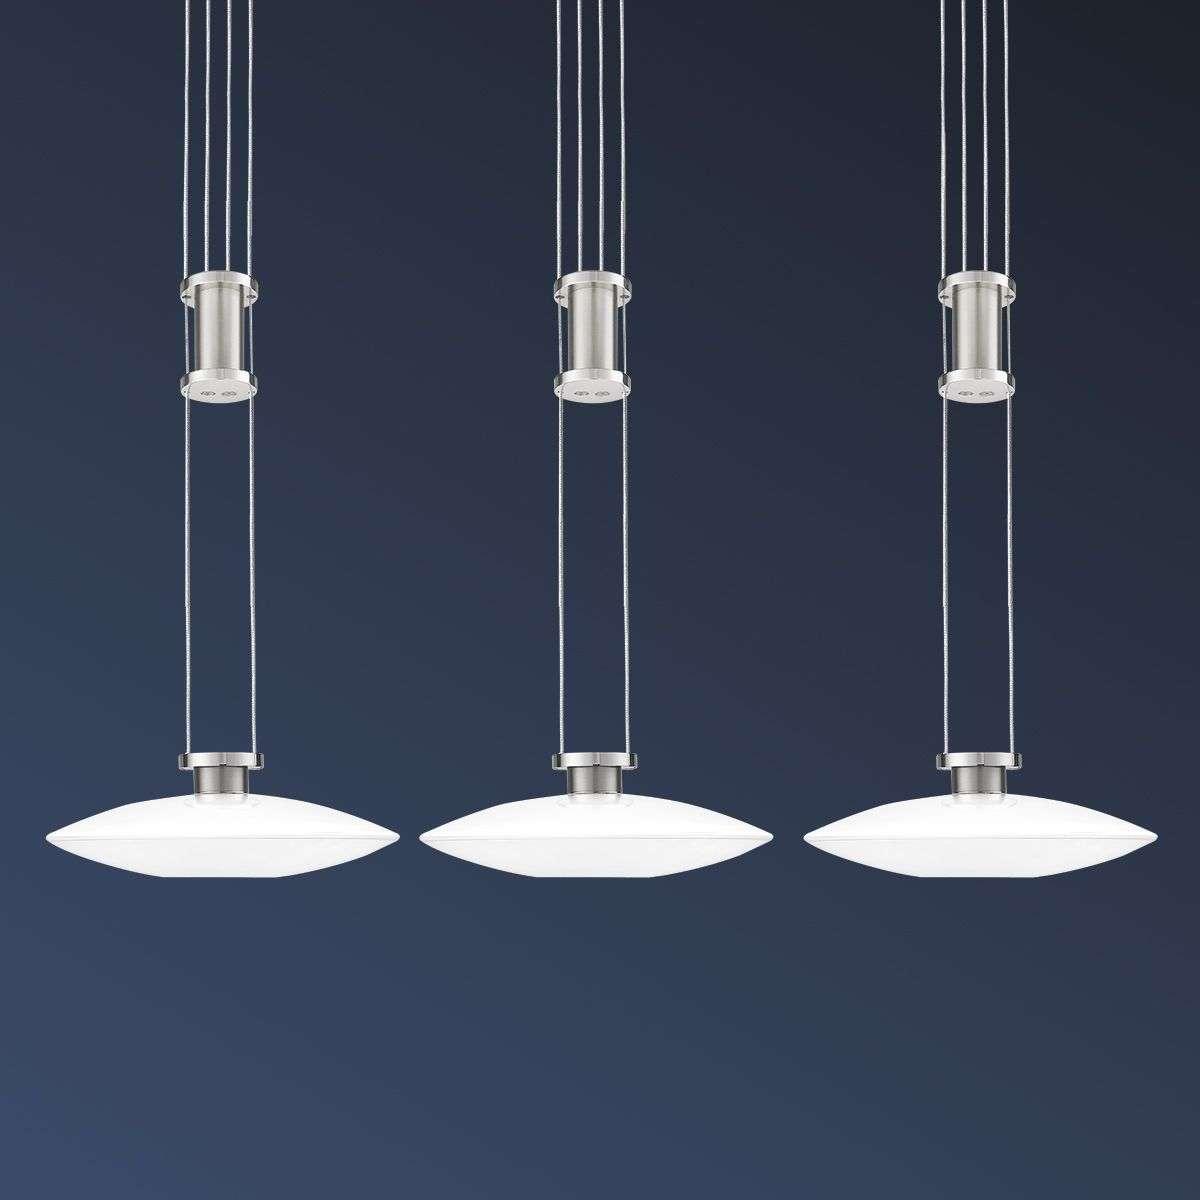 Three Bulb New Elina Led Ceiling Light Nickel 8504791 31